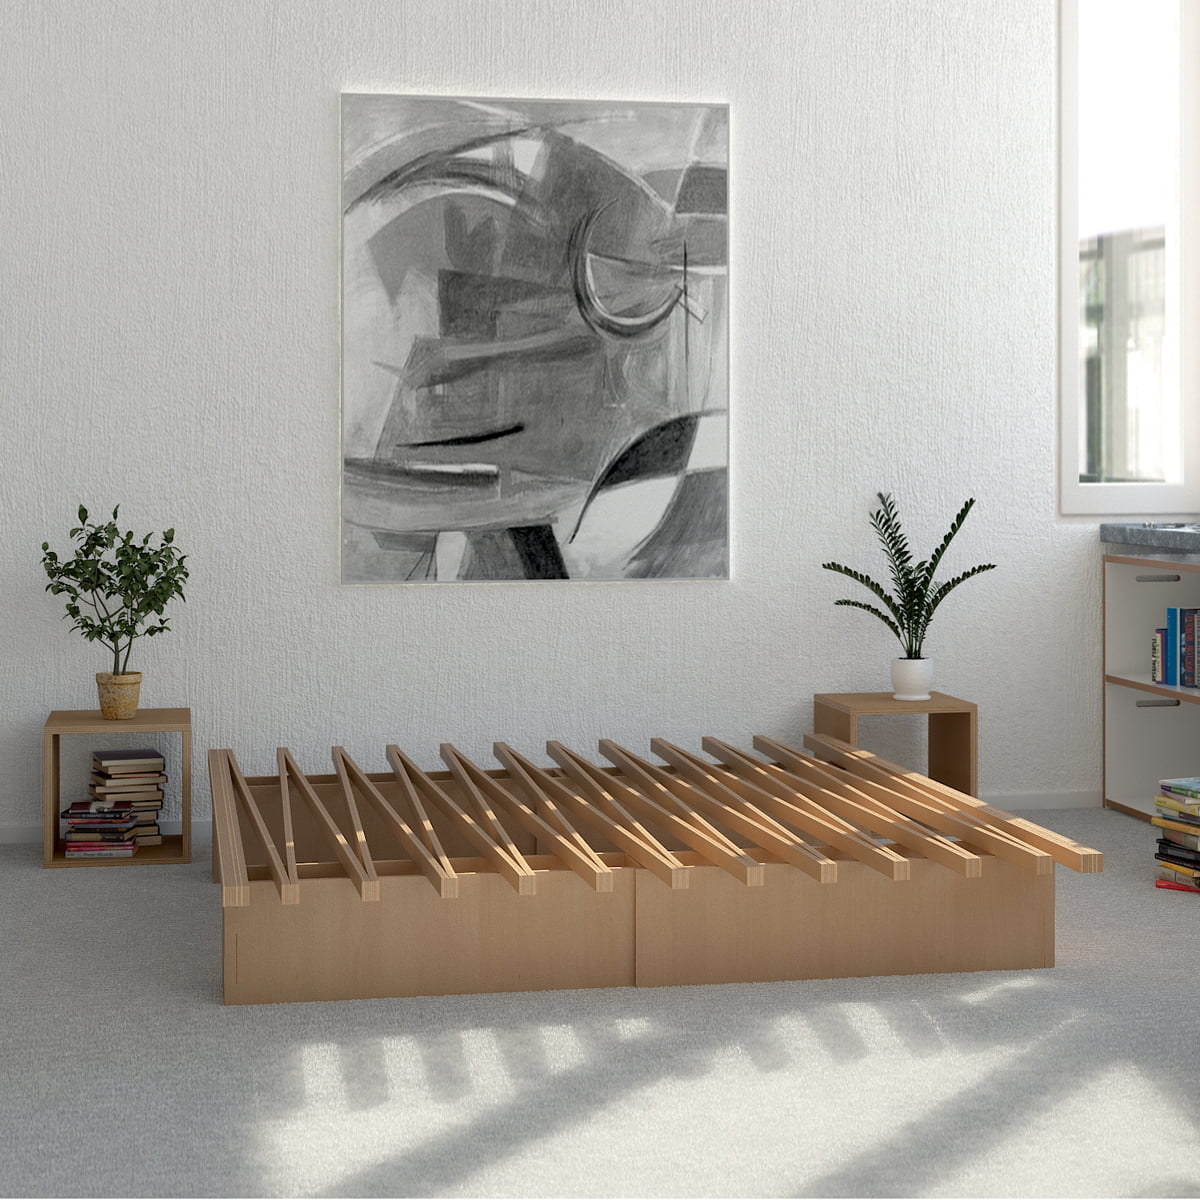 Full Size of Tojo V Bett System Gebraucht Kaufen Gestell Test Preisvergleich Selber Bauen Bewertung Matratzen Bett  Erfahrungen Lieg V Bett Bettgestell Betten Landhausstil Bett Tojo V Bett